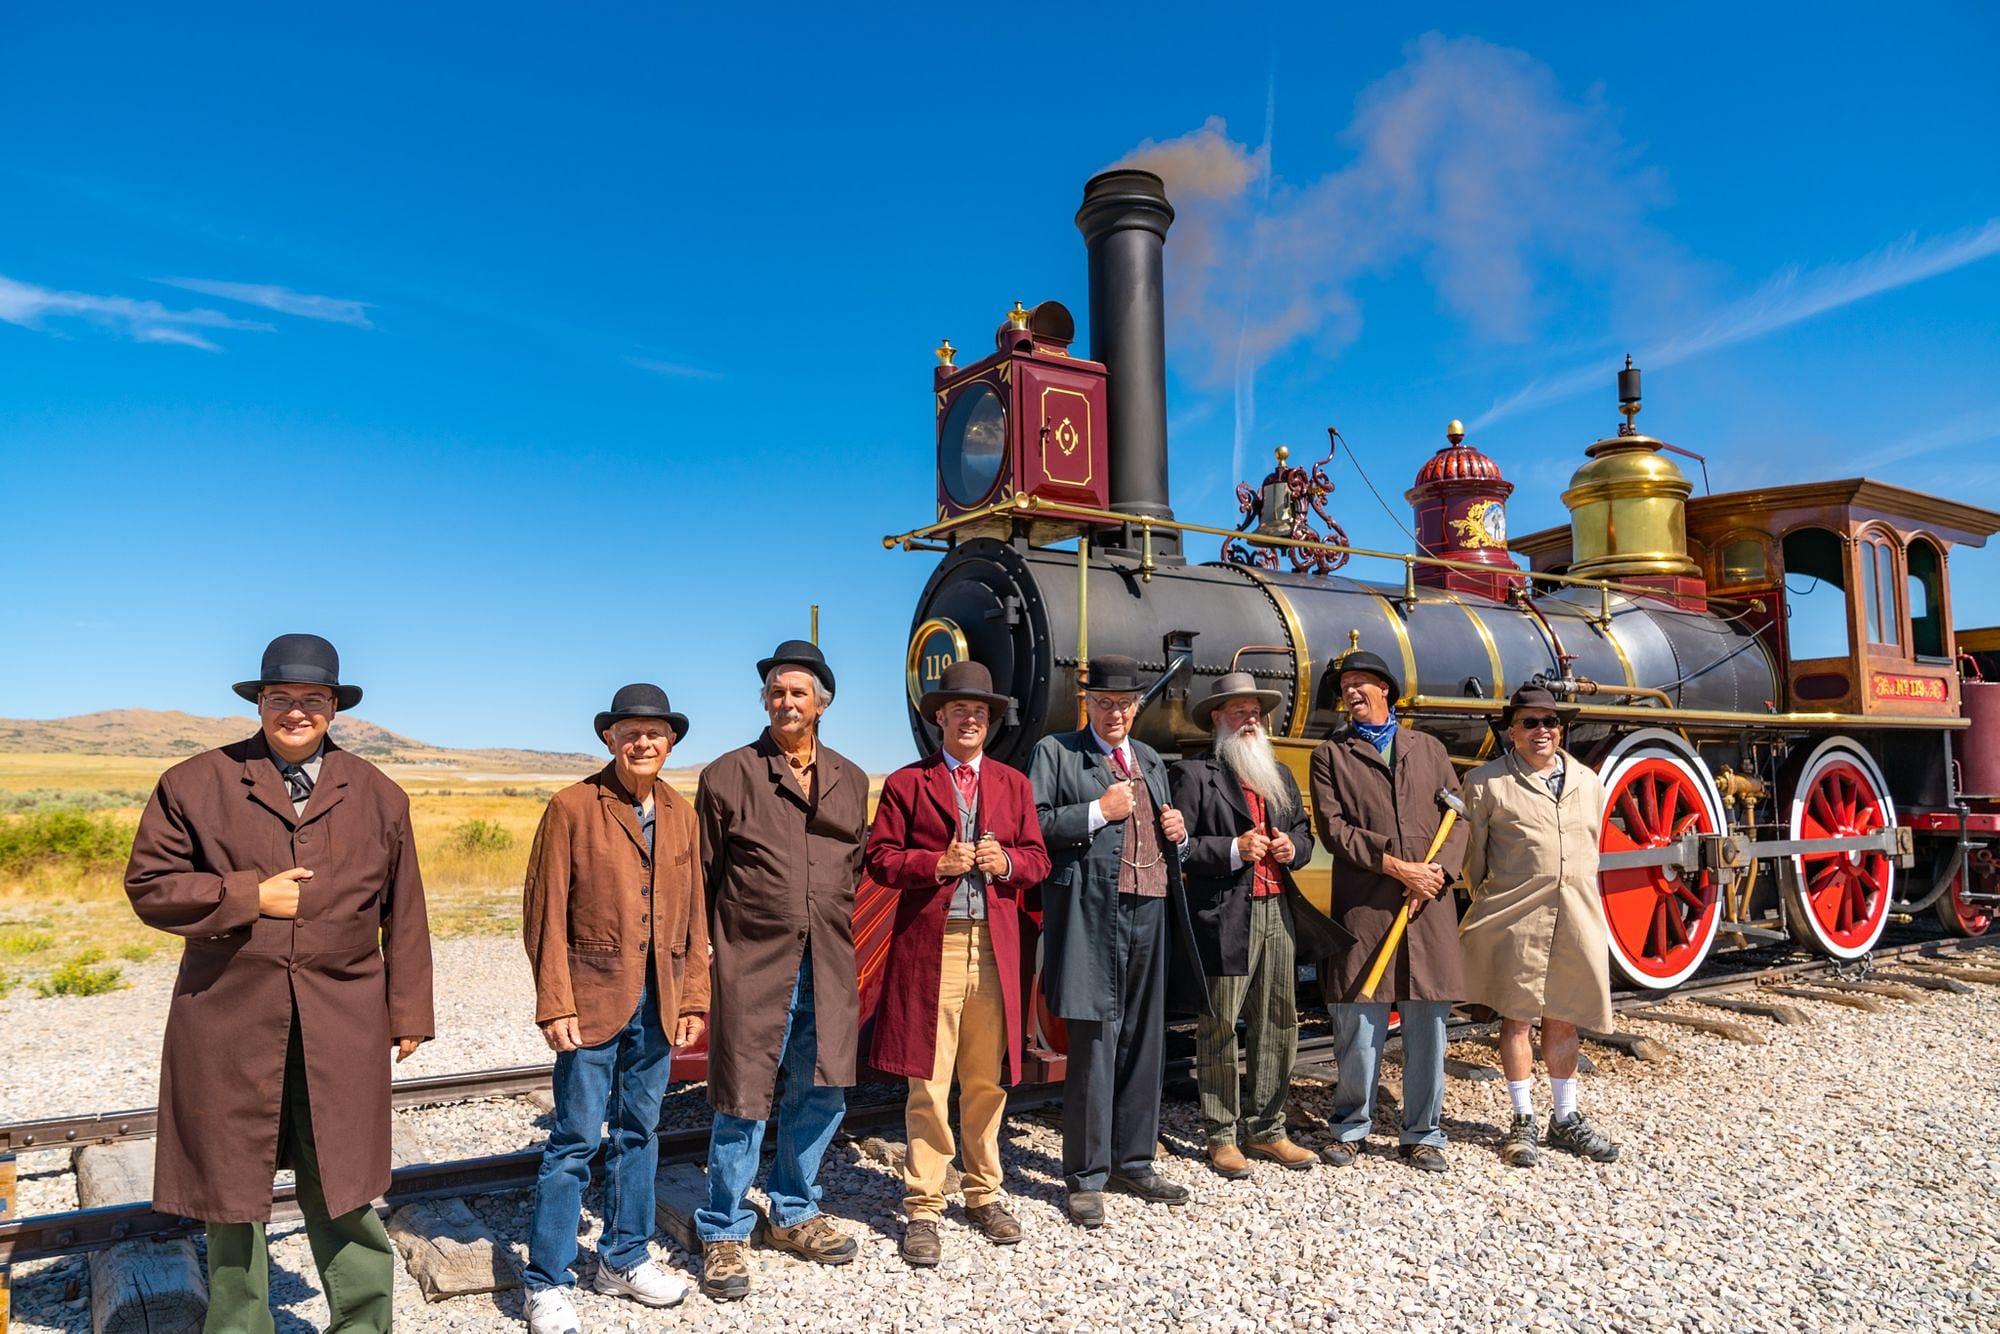 Golden Spike National Historical Park Reenactment